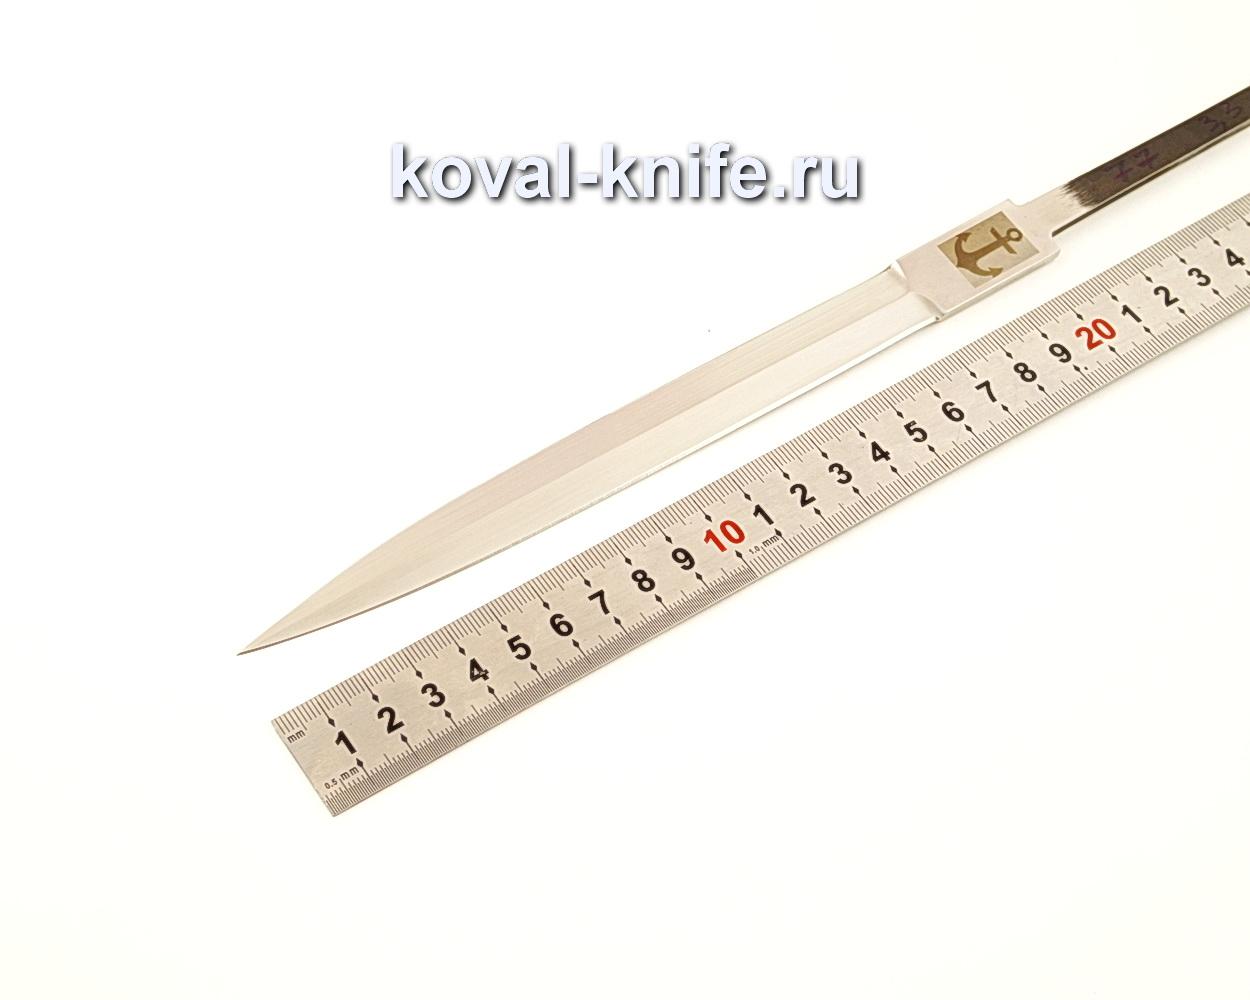 Клинок для Кортика из кованой 95Х18  N77